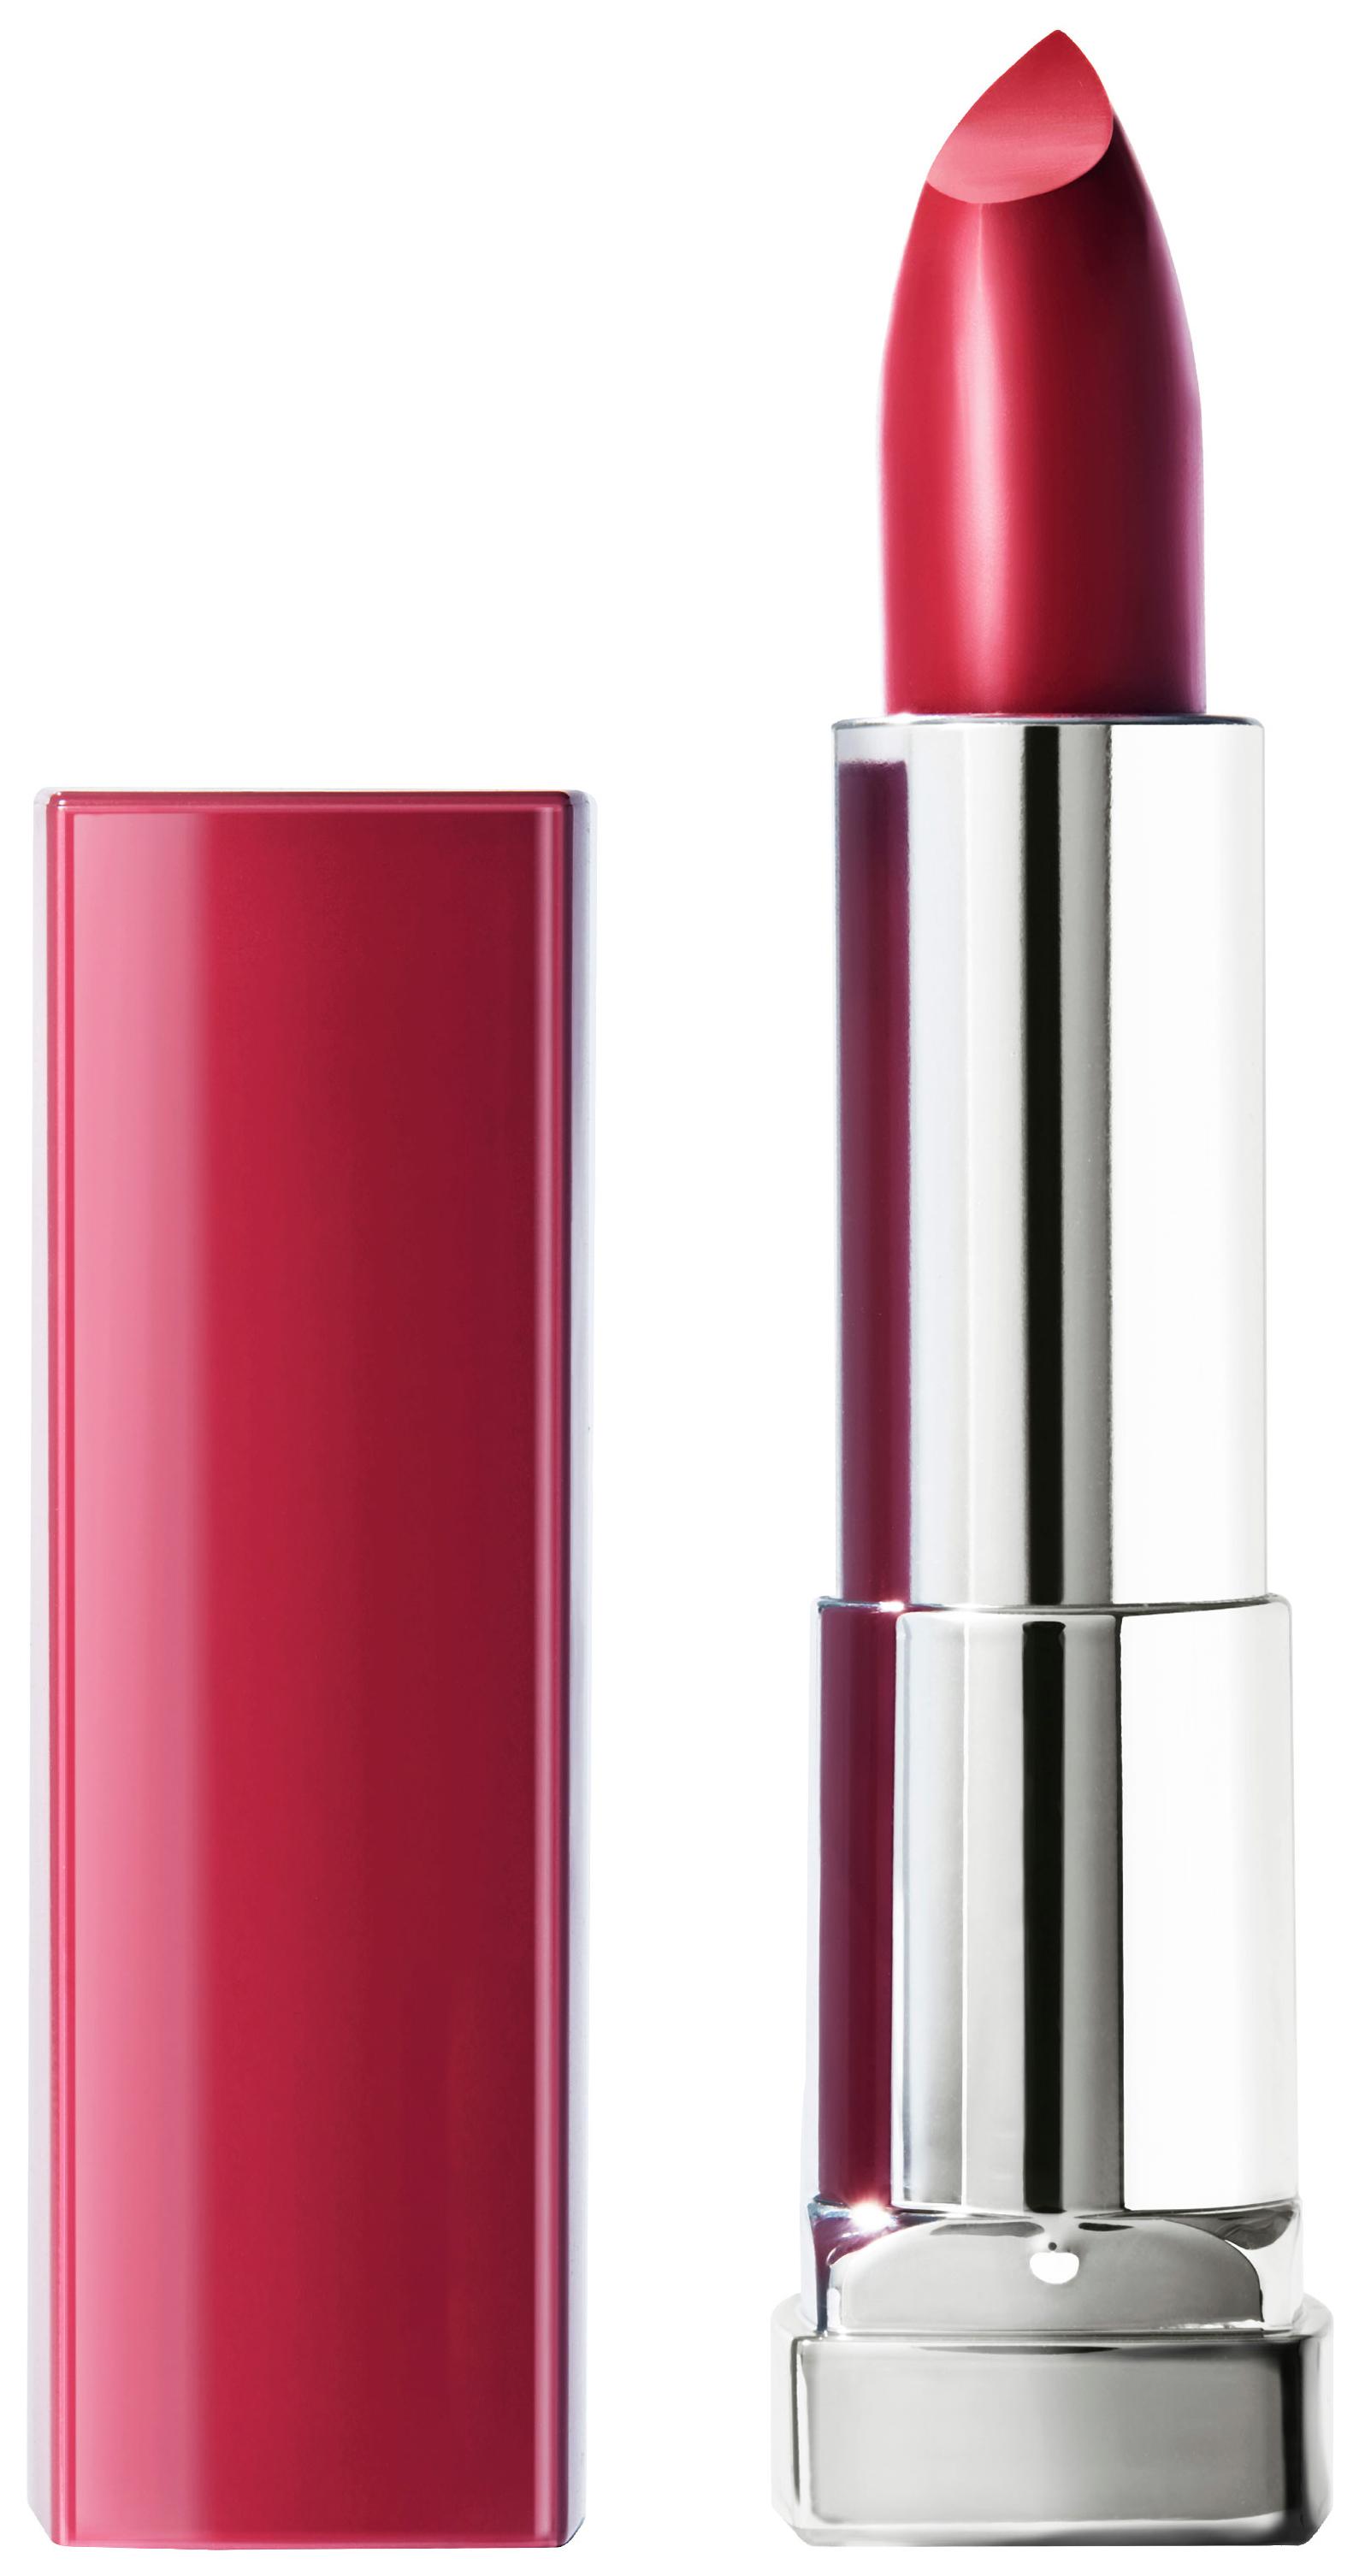 Купить Помада Maybelline Color Sensational Made for all Lipstick 388 Plum For Me 5 г, Maybelline New York